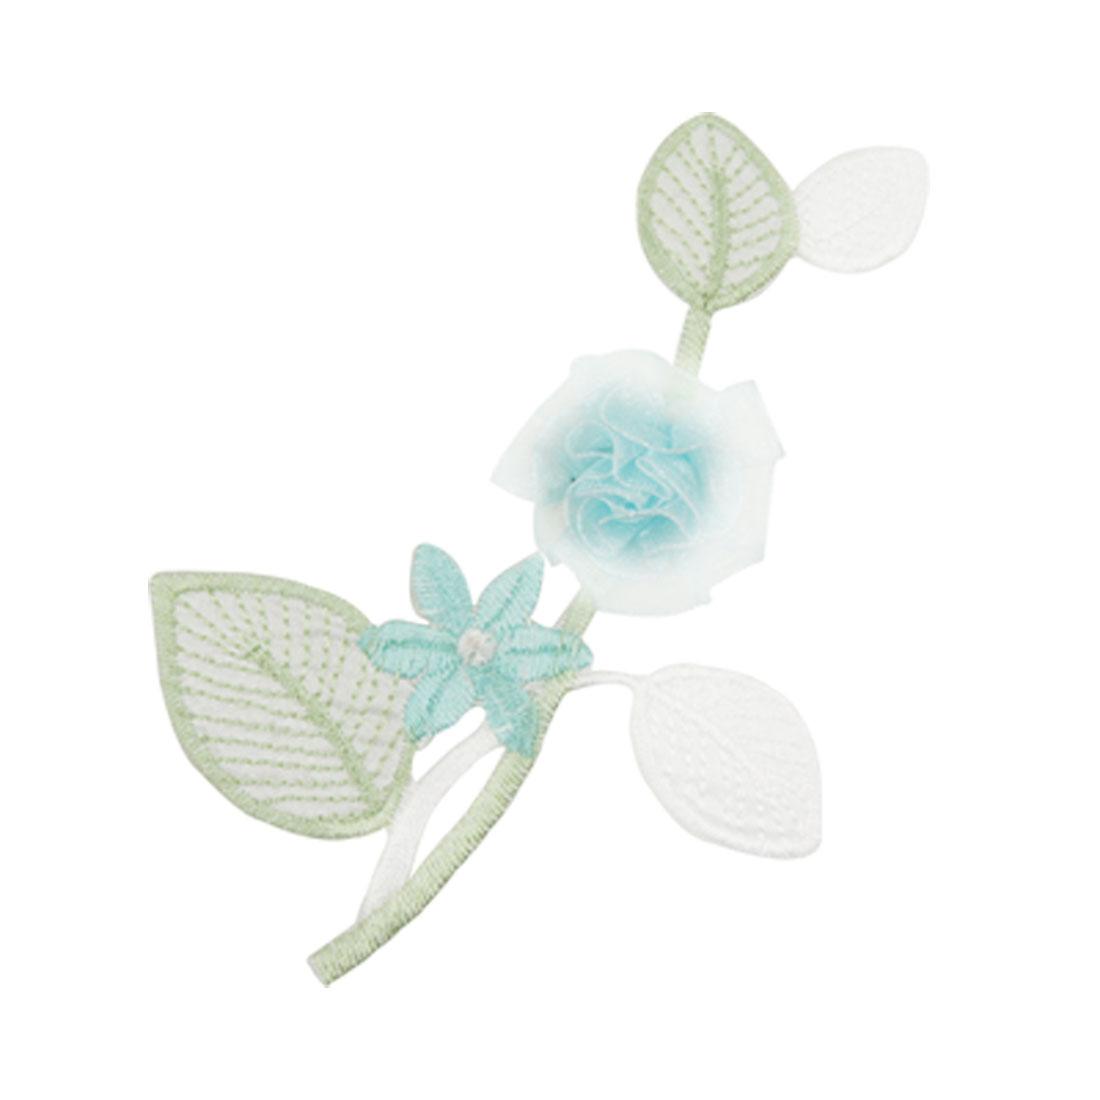 Shirt Embroidered Badge Jacket 3D Flower Design Patch